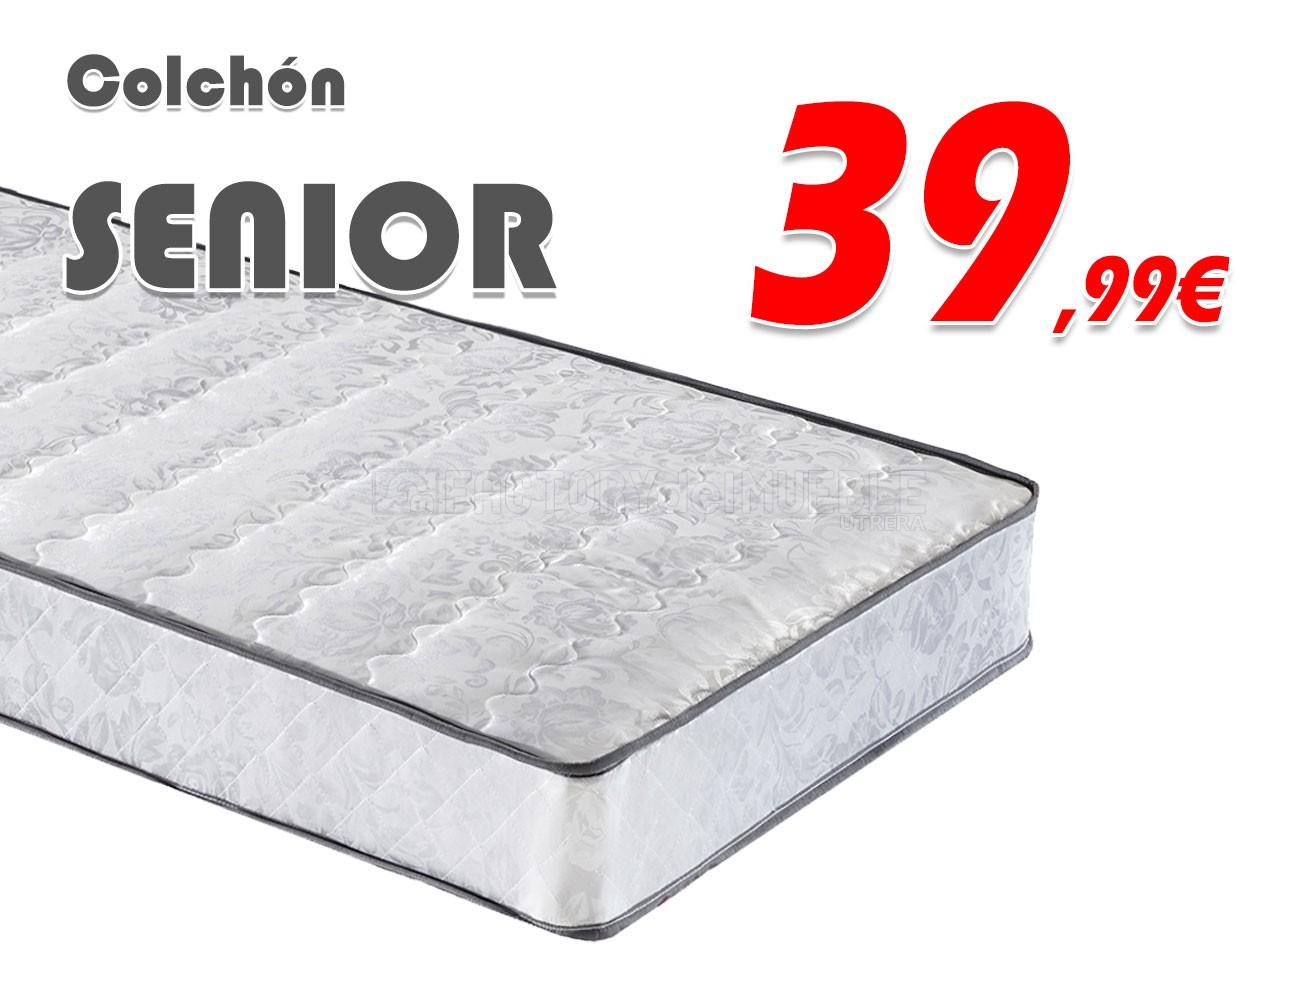 Colchon senior1